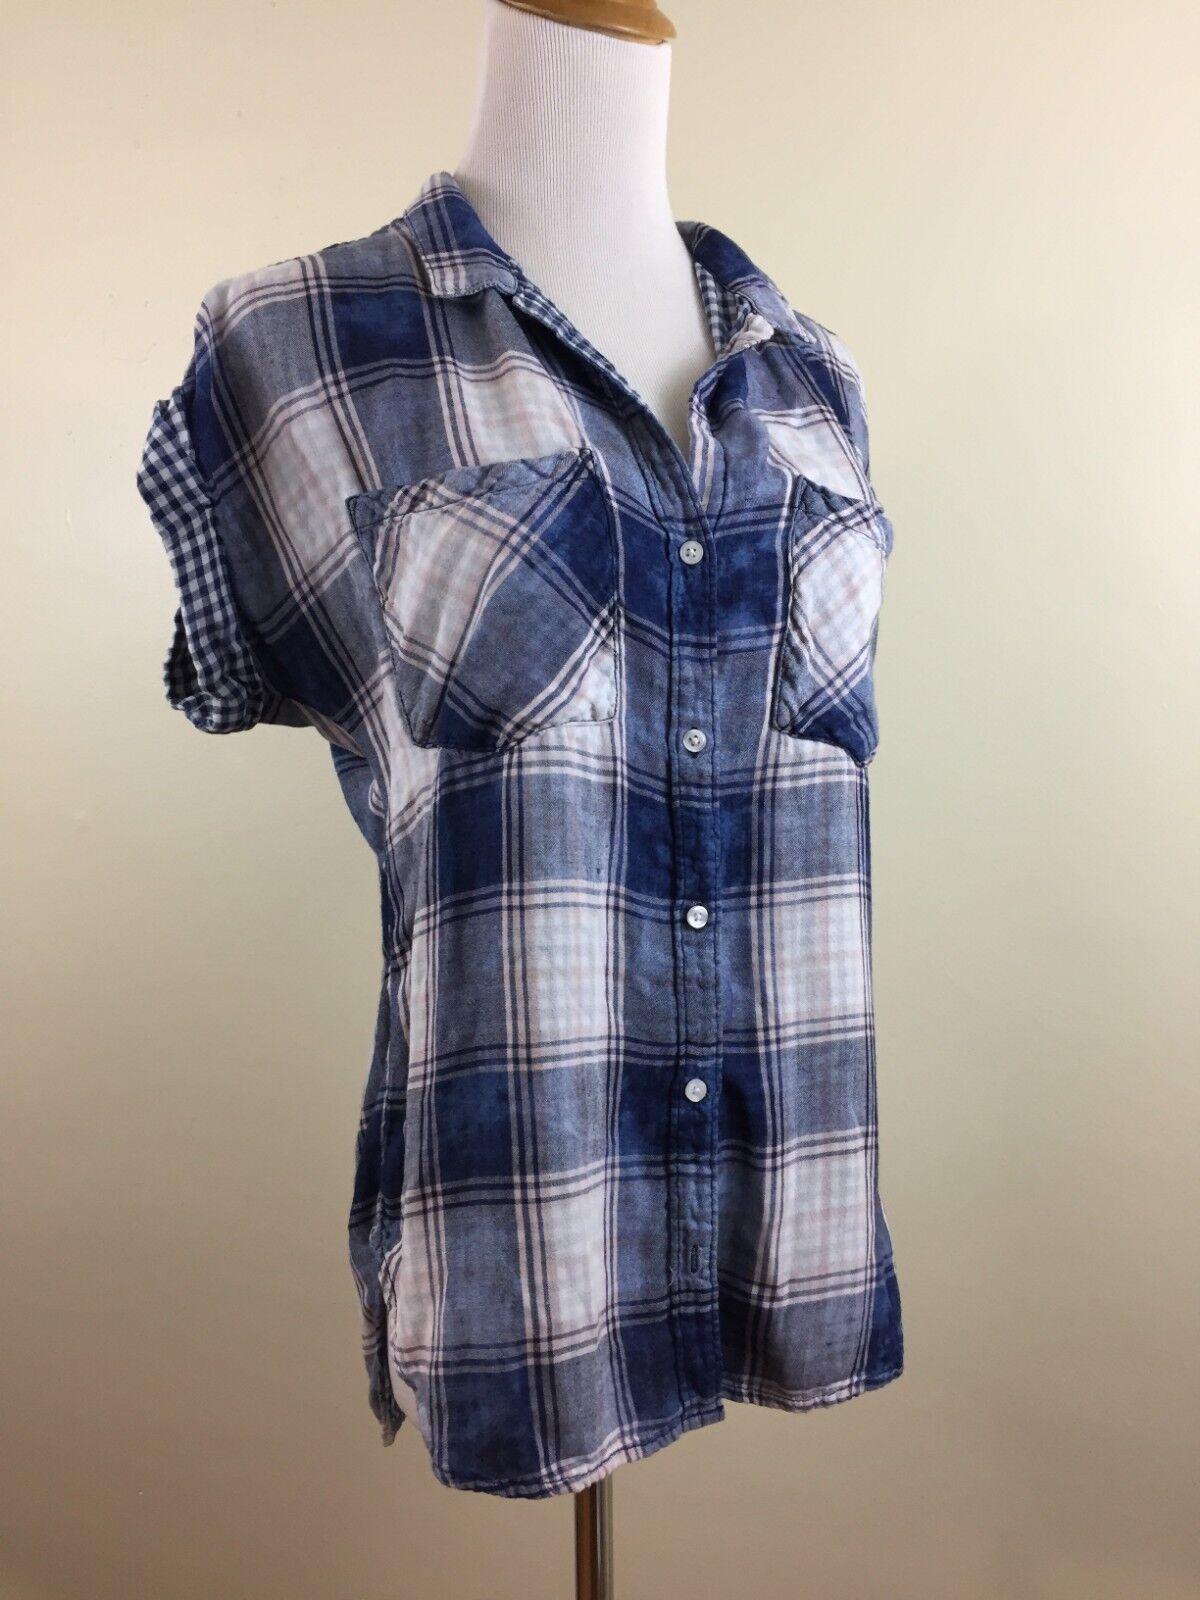 Cloth & Stone Anthropologie damen S Small Blau Weiß Rosa Plaids Checks Shirt